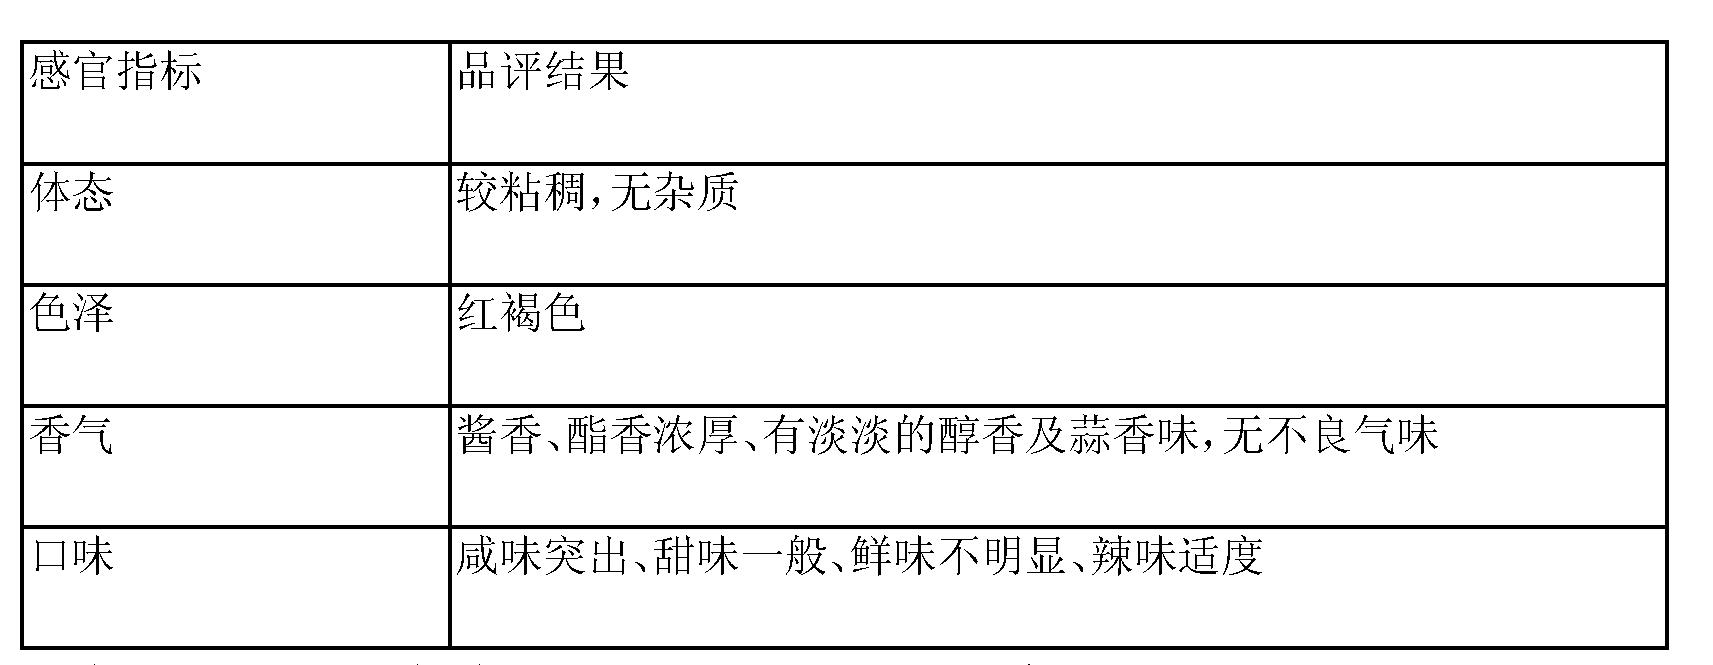 Figure CN103070387AD00202